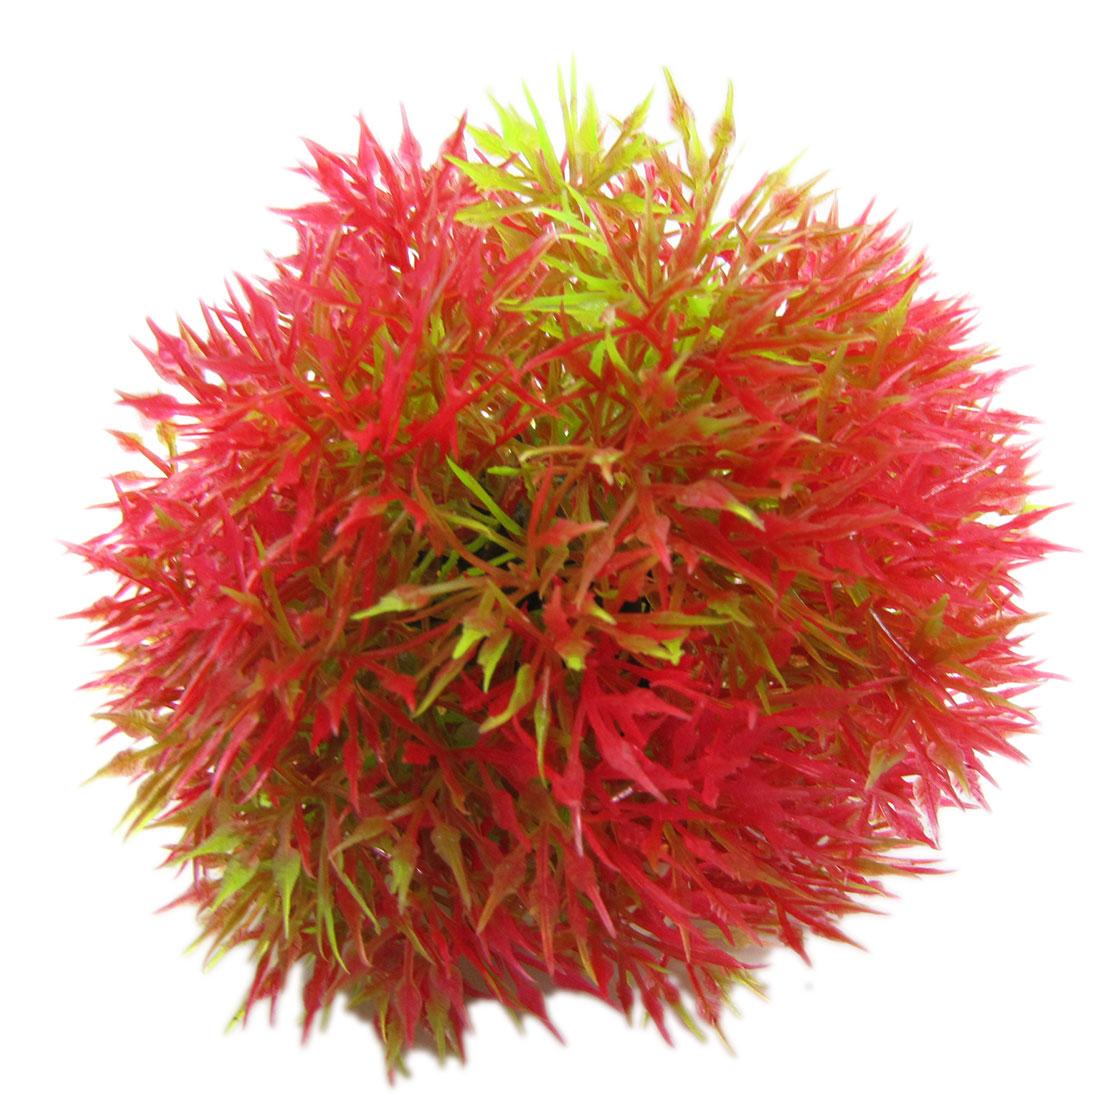 Decorative Fish Tank Ceramic Base Red Green Plastic Cactus